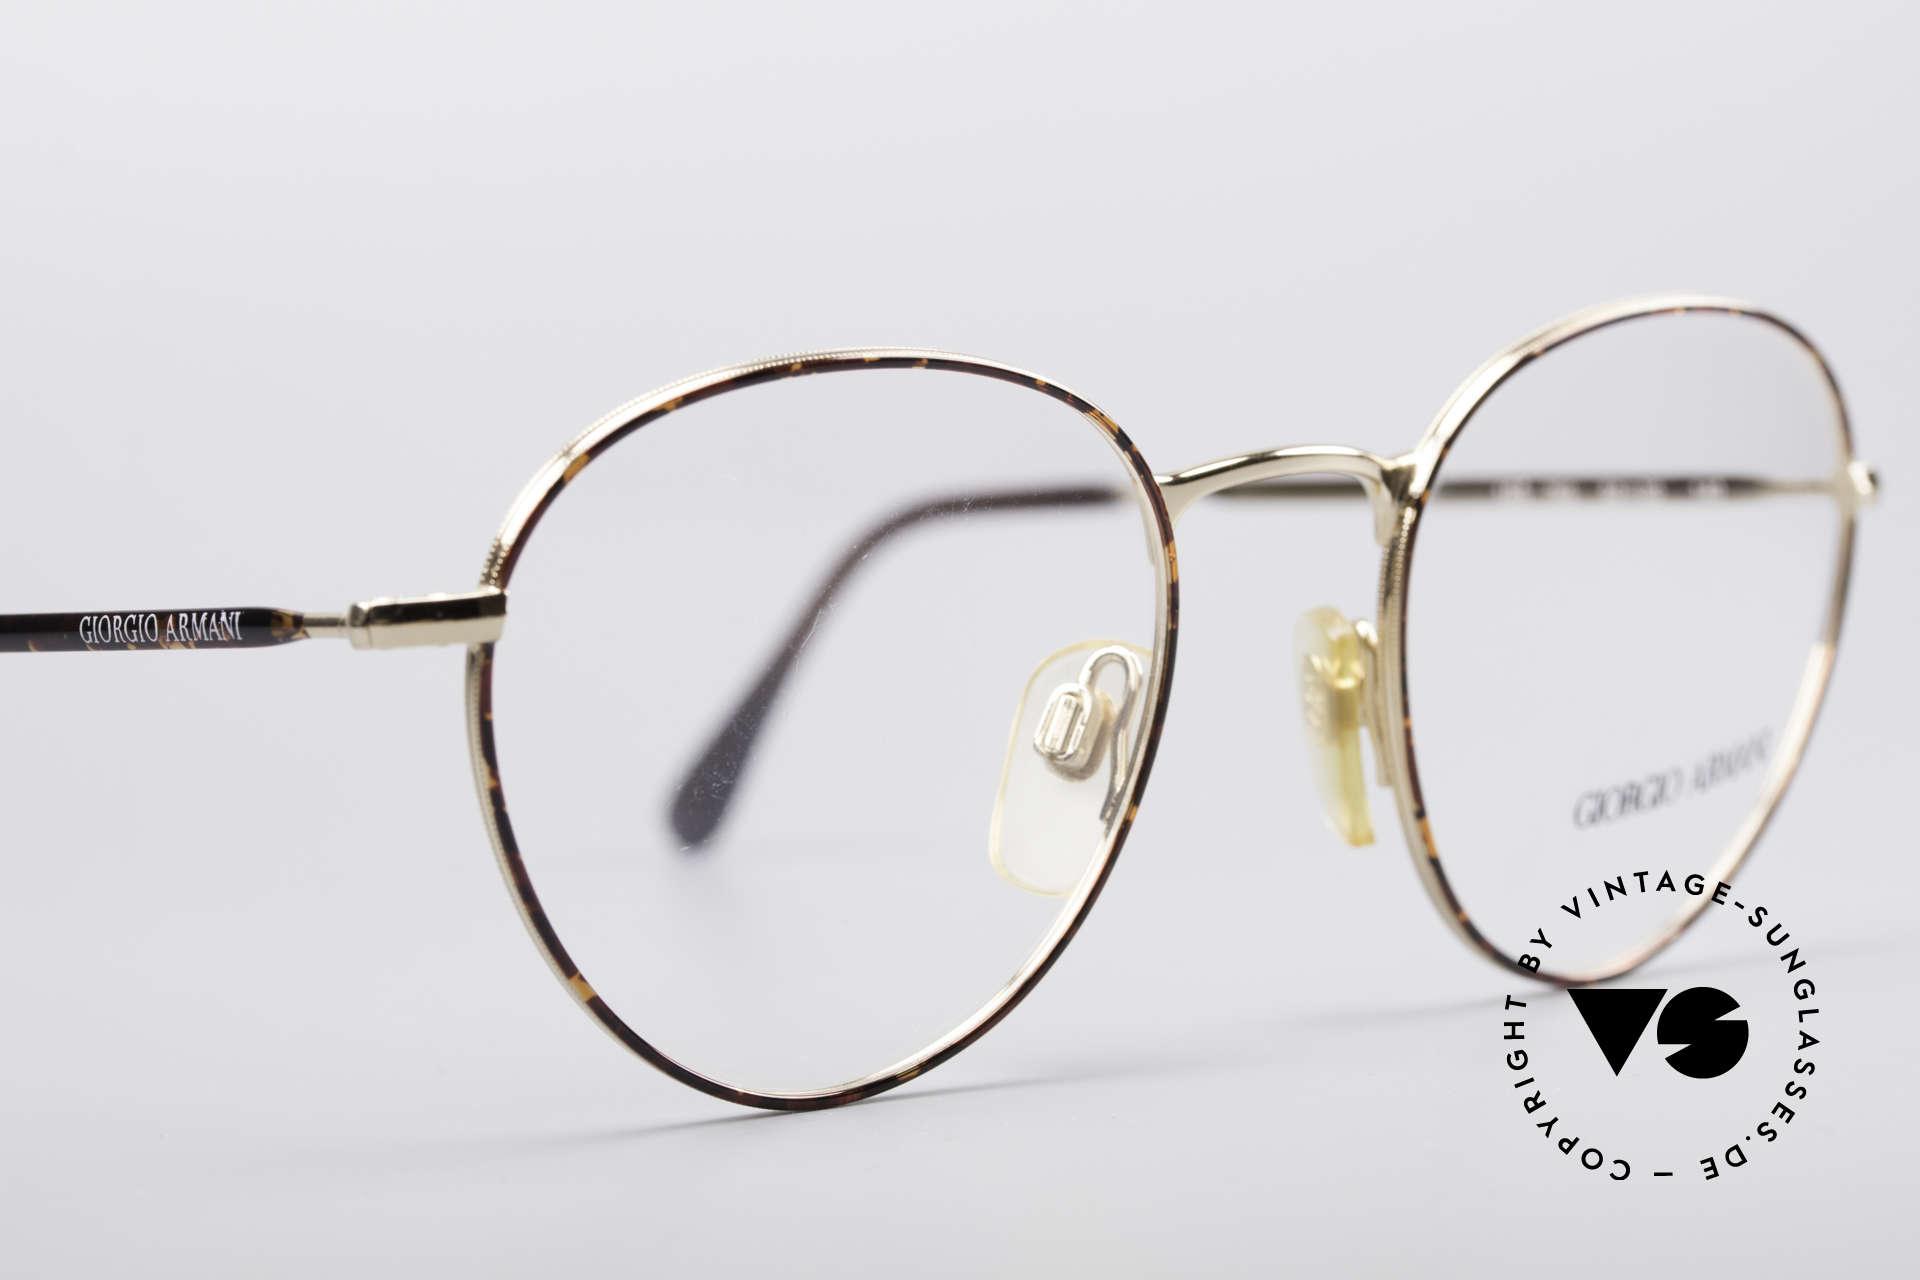 Giorgio Armani 165 Panto Vintage Glasses 80s 90s, unworn (like all our vintage GIORGIO Armani frames), Made for Men